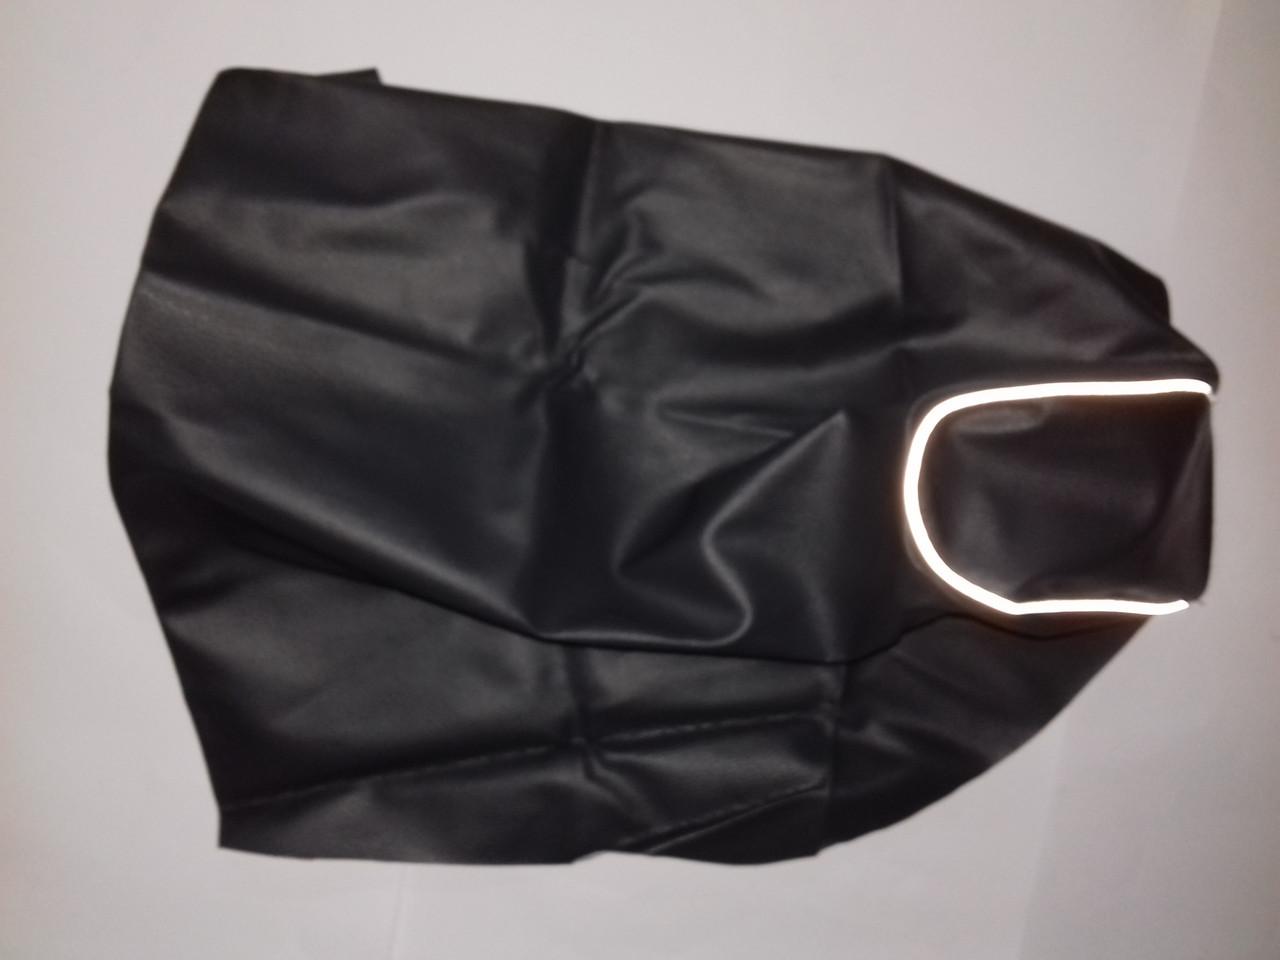 Чехол сиденья LETS I/II/III темносерый, светоотражающий кант JOHN DOE